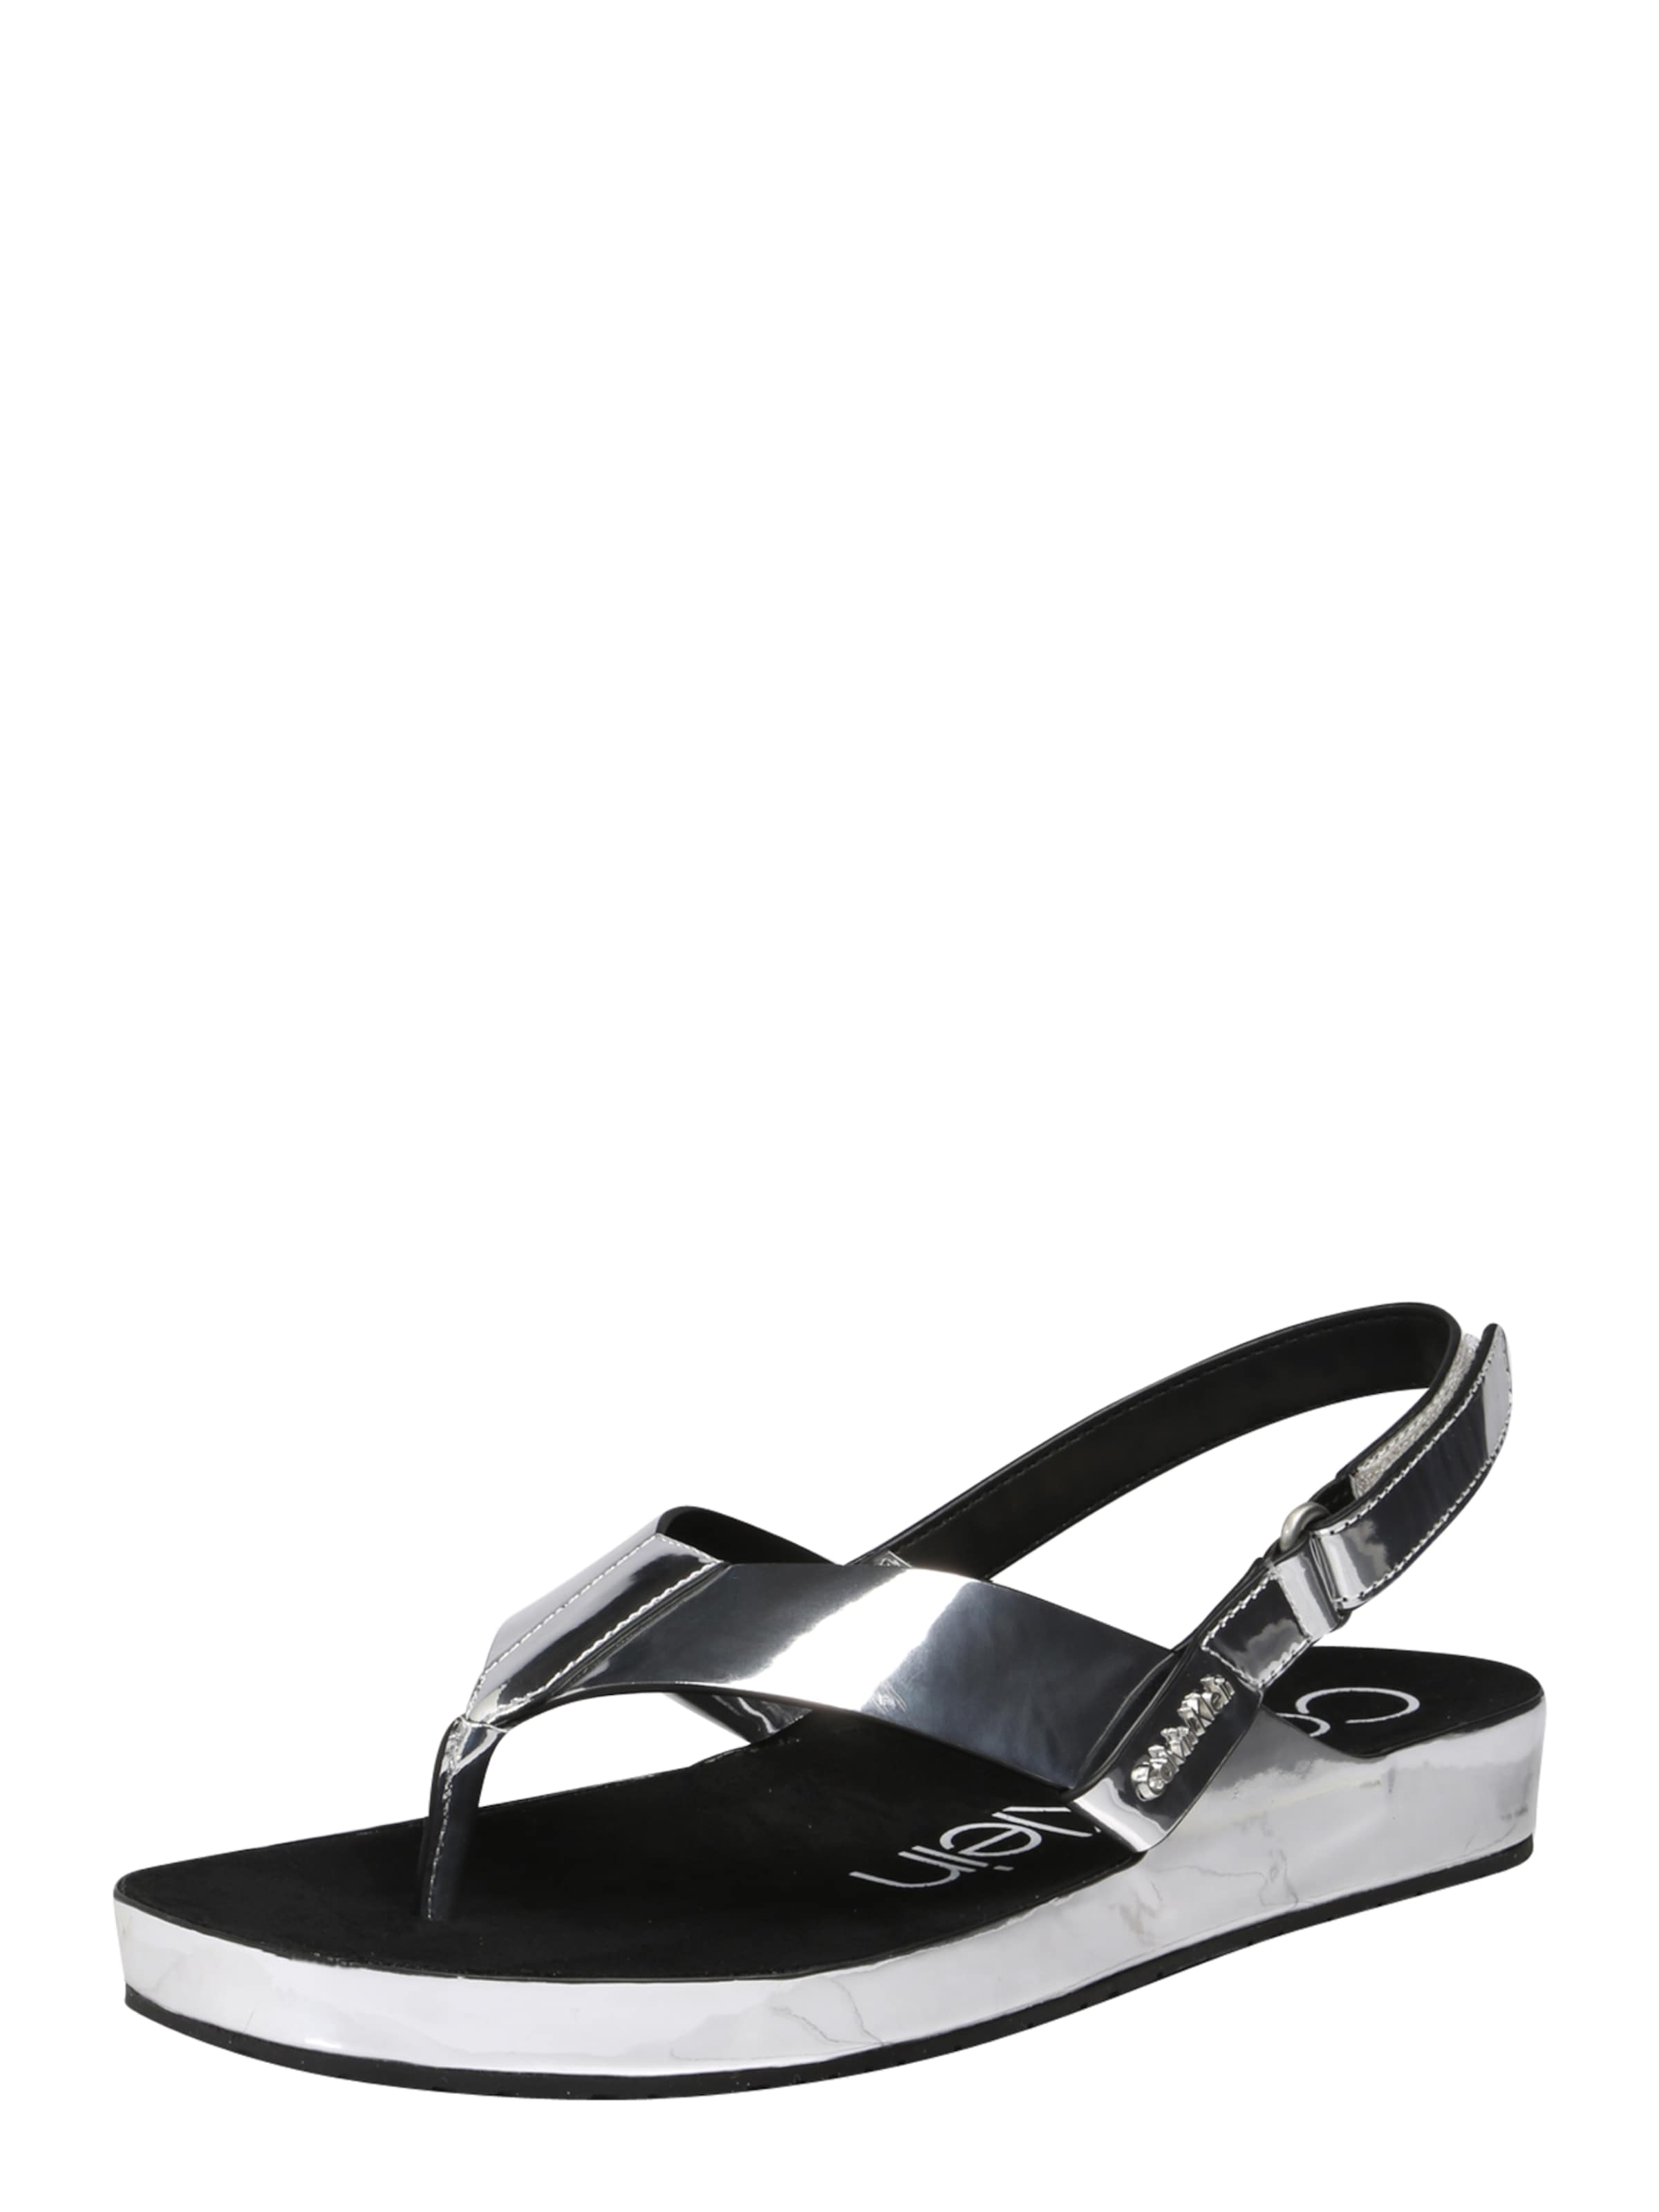 Haltbare Mode billige Schuhe Calvin Klein | Sandalen 'MANIRA' Schuhe Gut getragene Schuhe